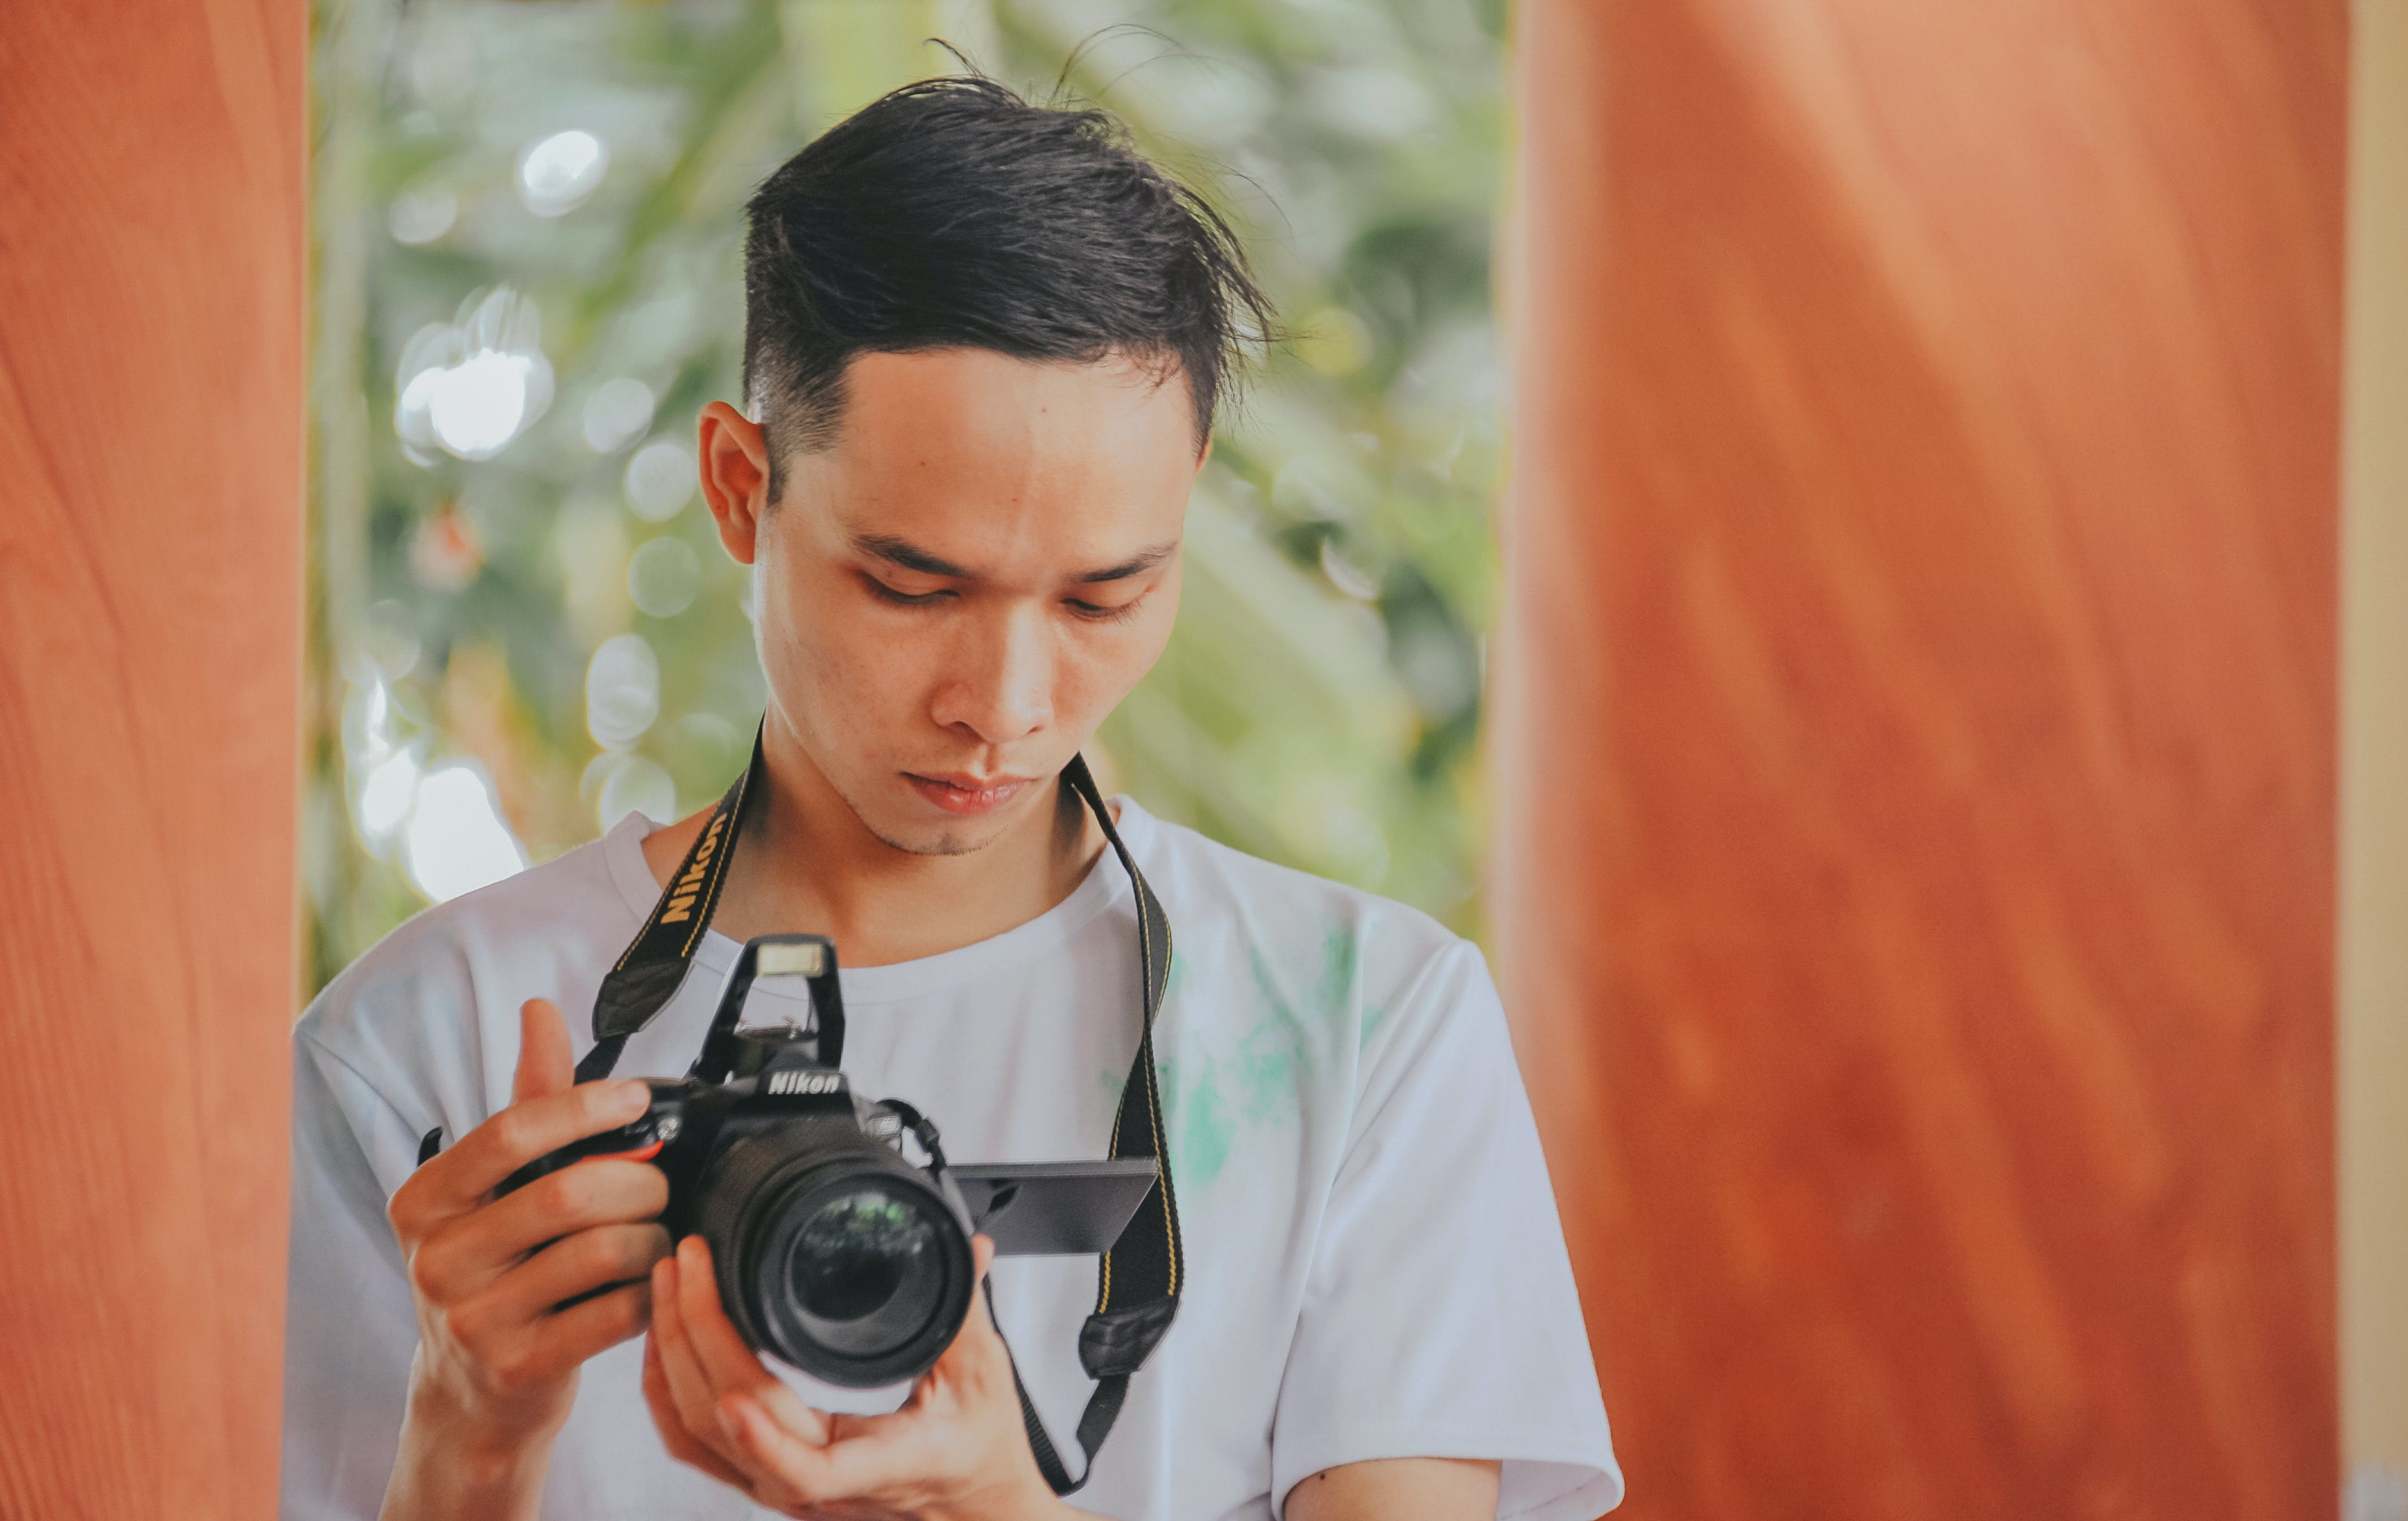 Gratis arkivbilde med bruke, dagslys, fotograf, fotografi